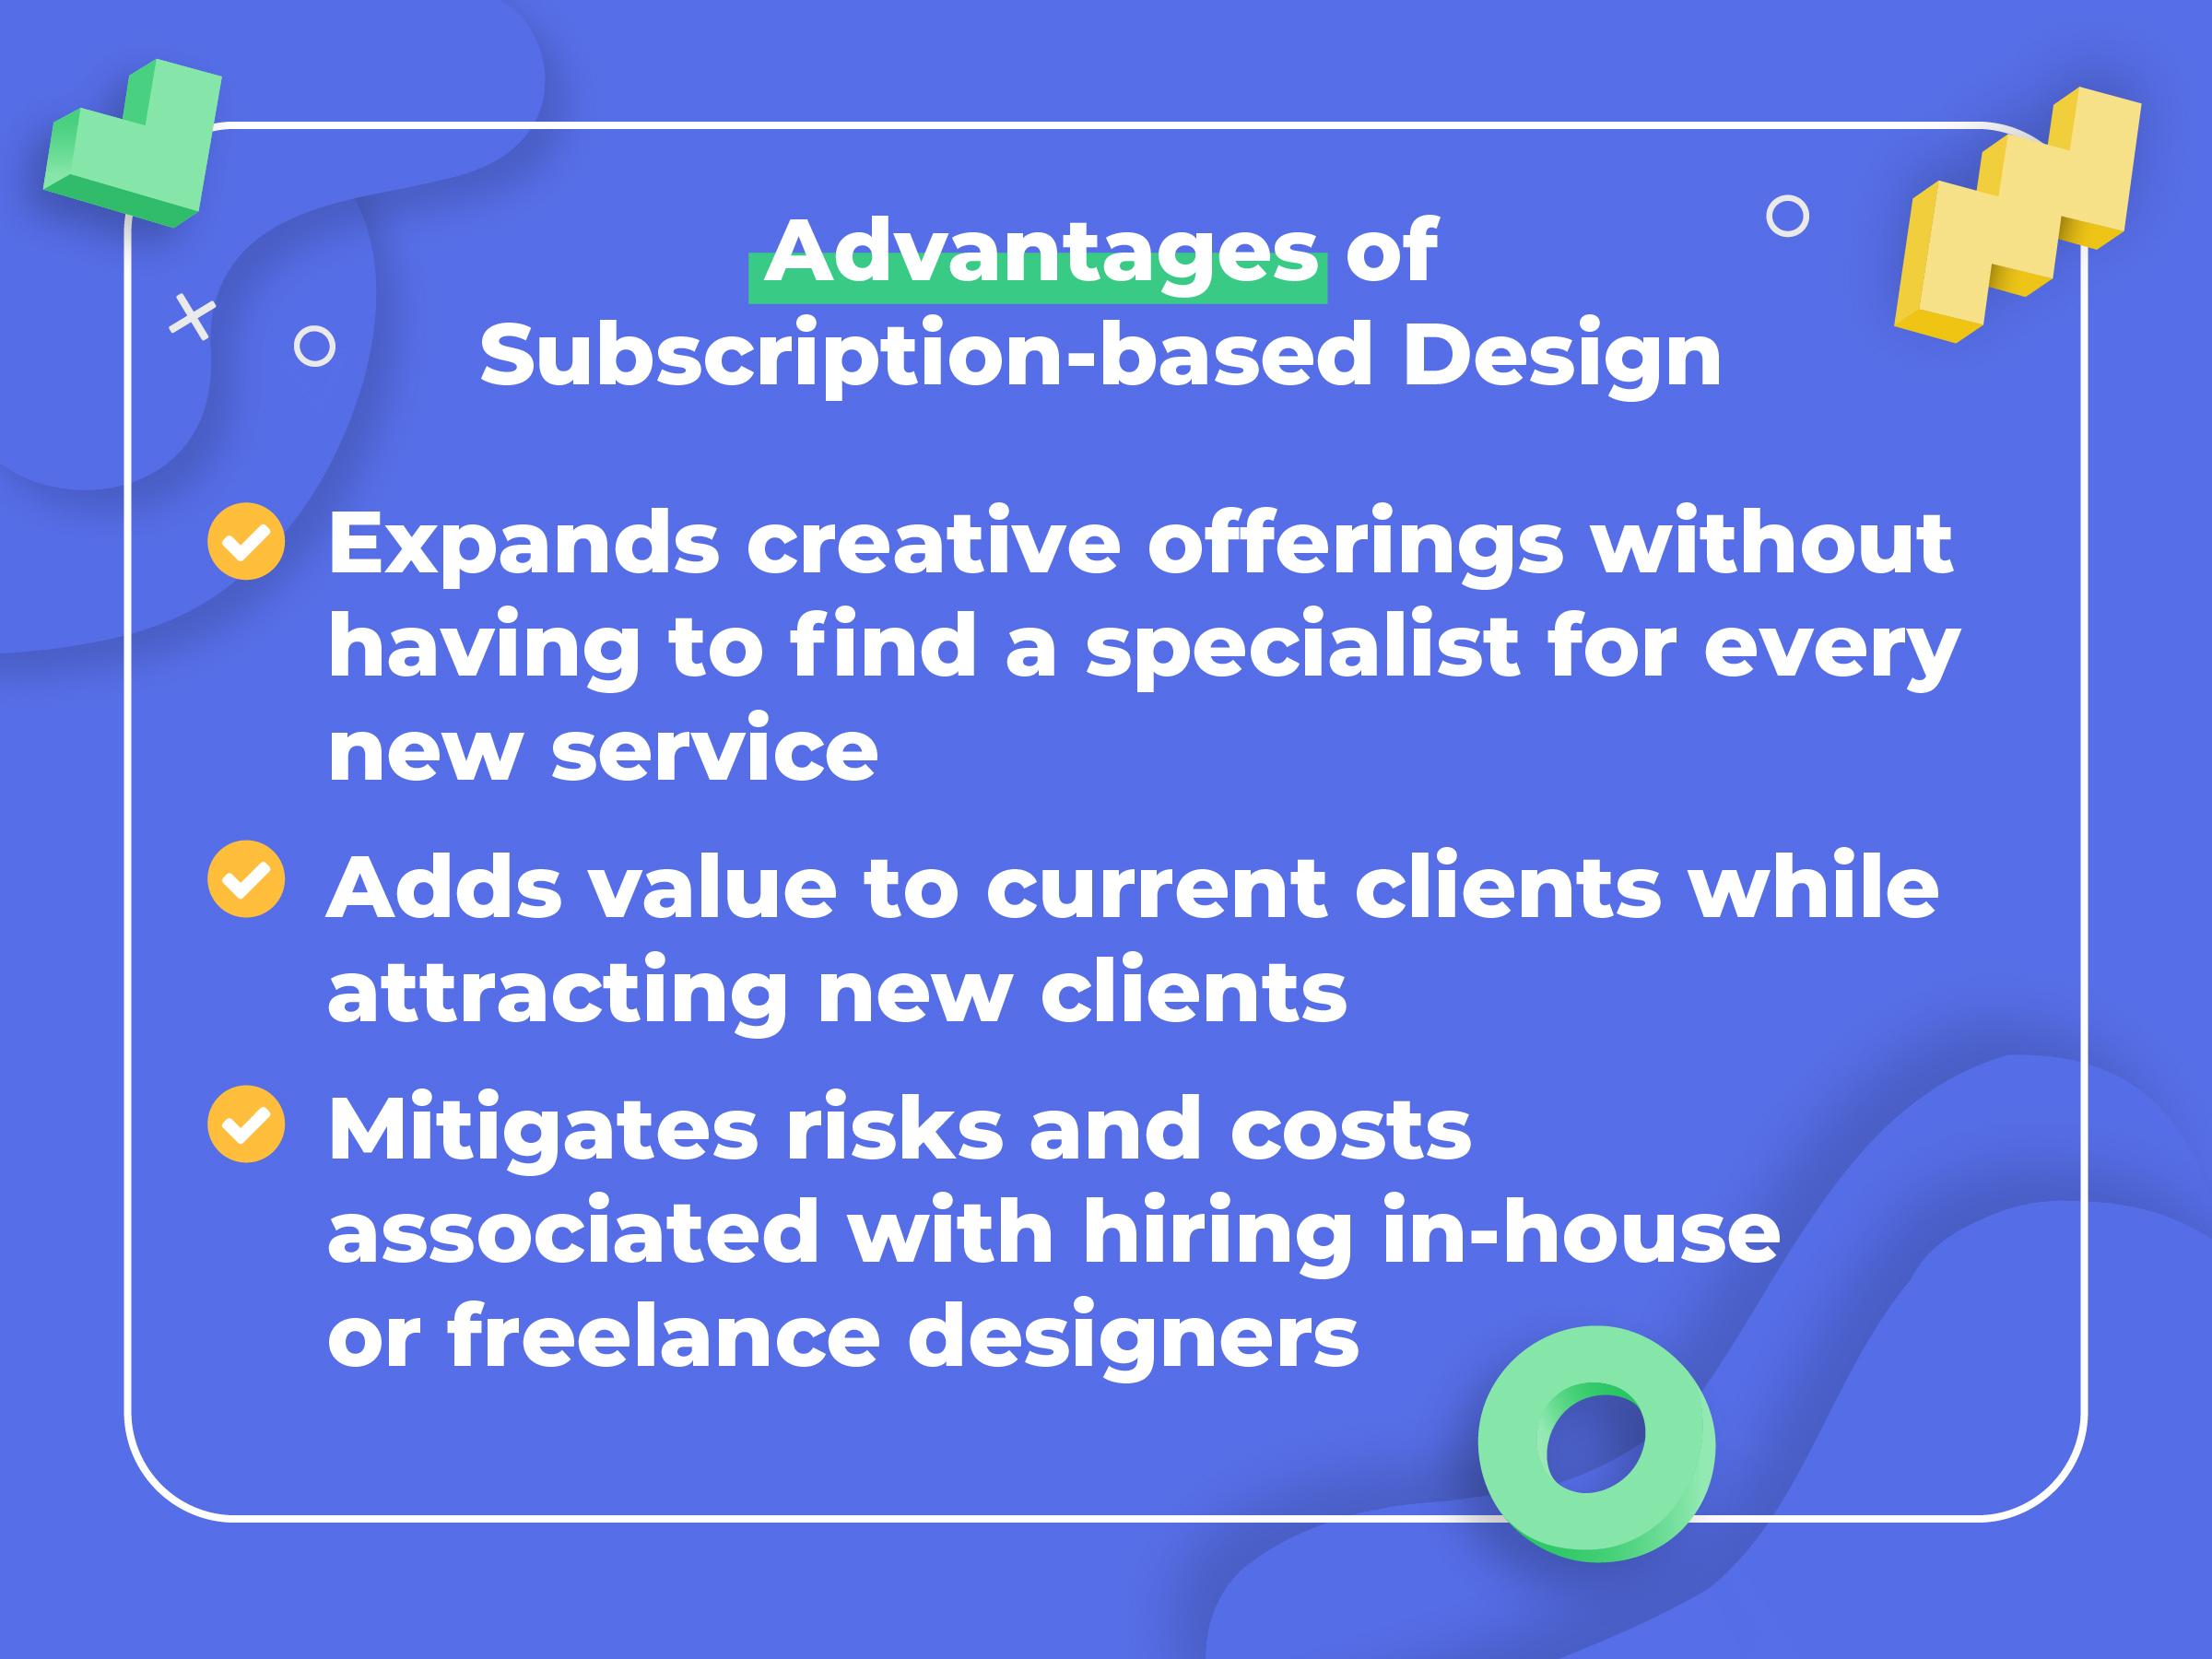 Advantages of Subscription-based Design